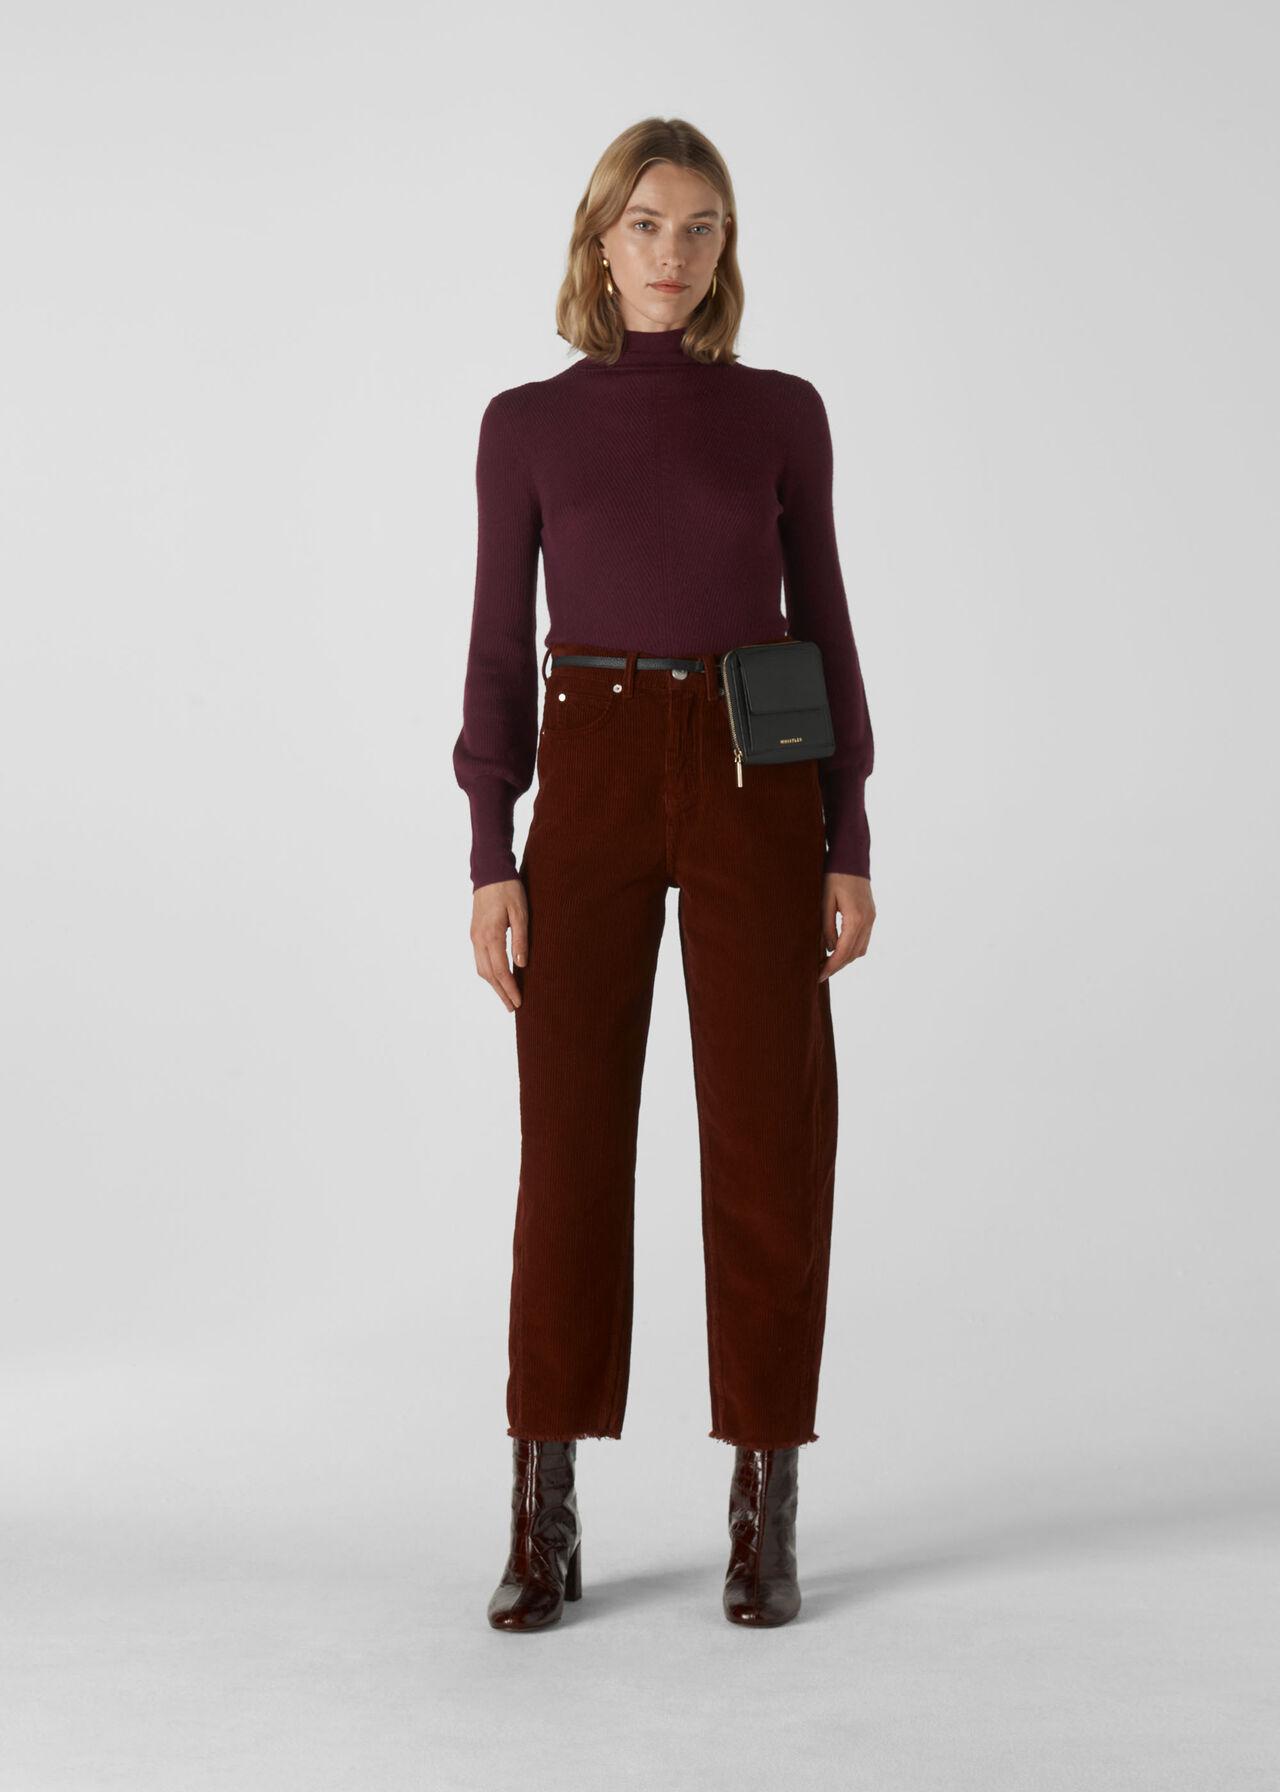 Merino Wool Roll Neck Knit Burgundy